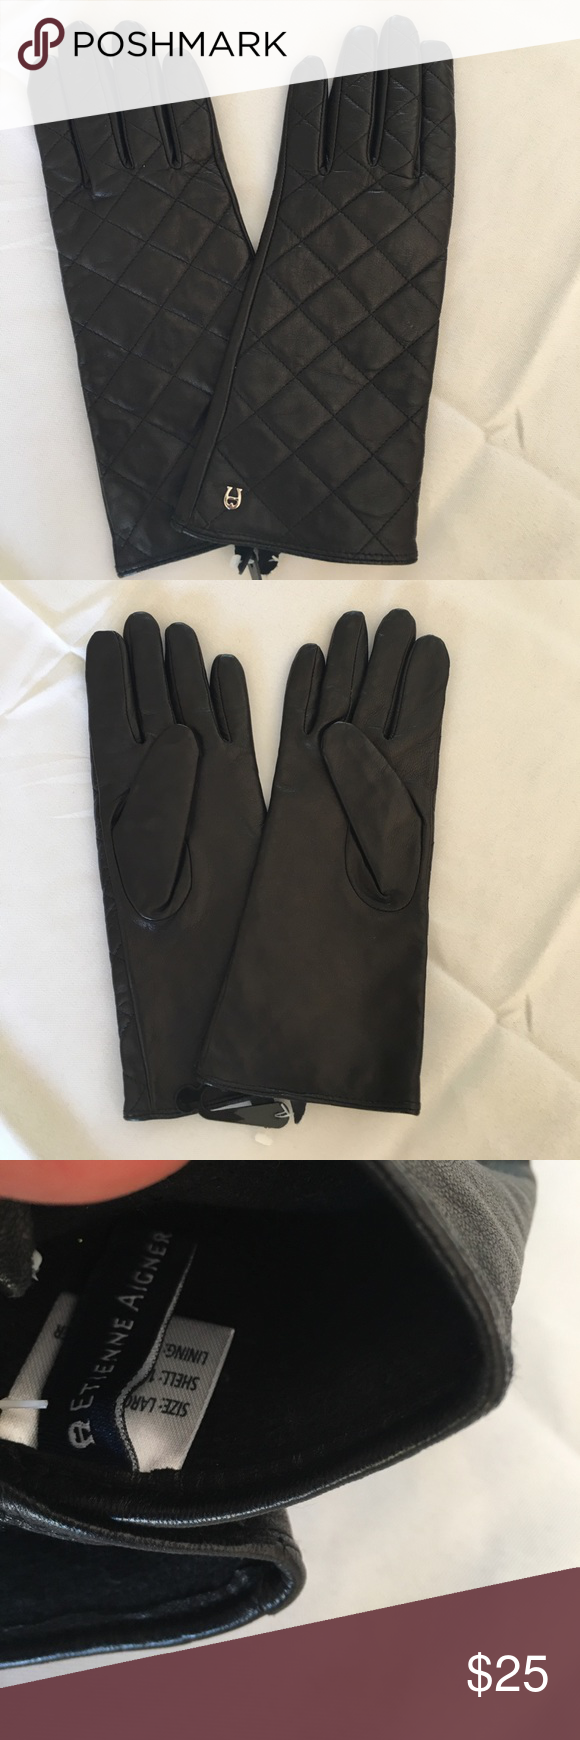 Etienne aigner black leather gloves -